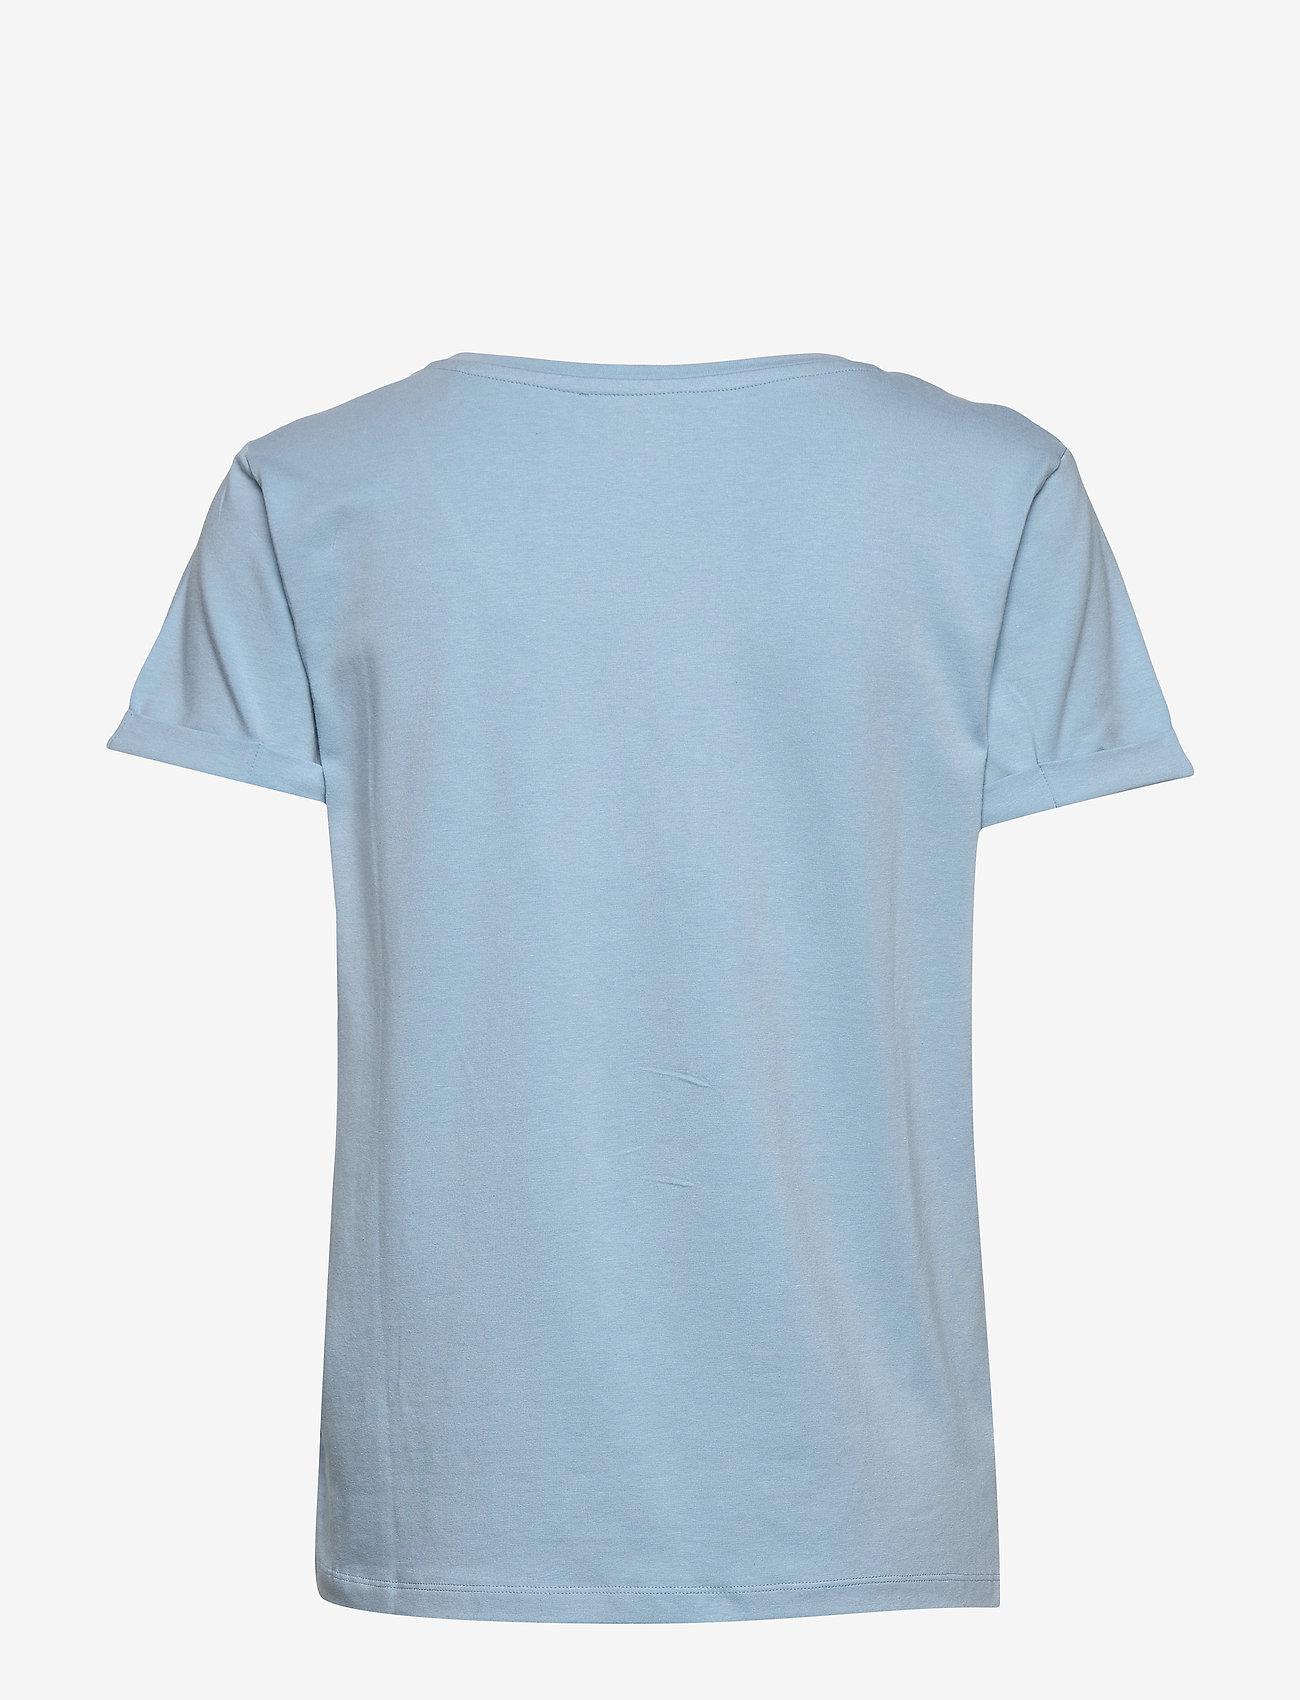 Minus - Adele tee - t-shirts - bounty blue - 1